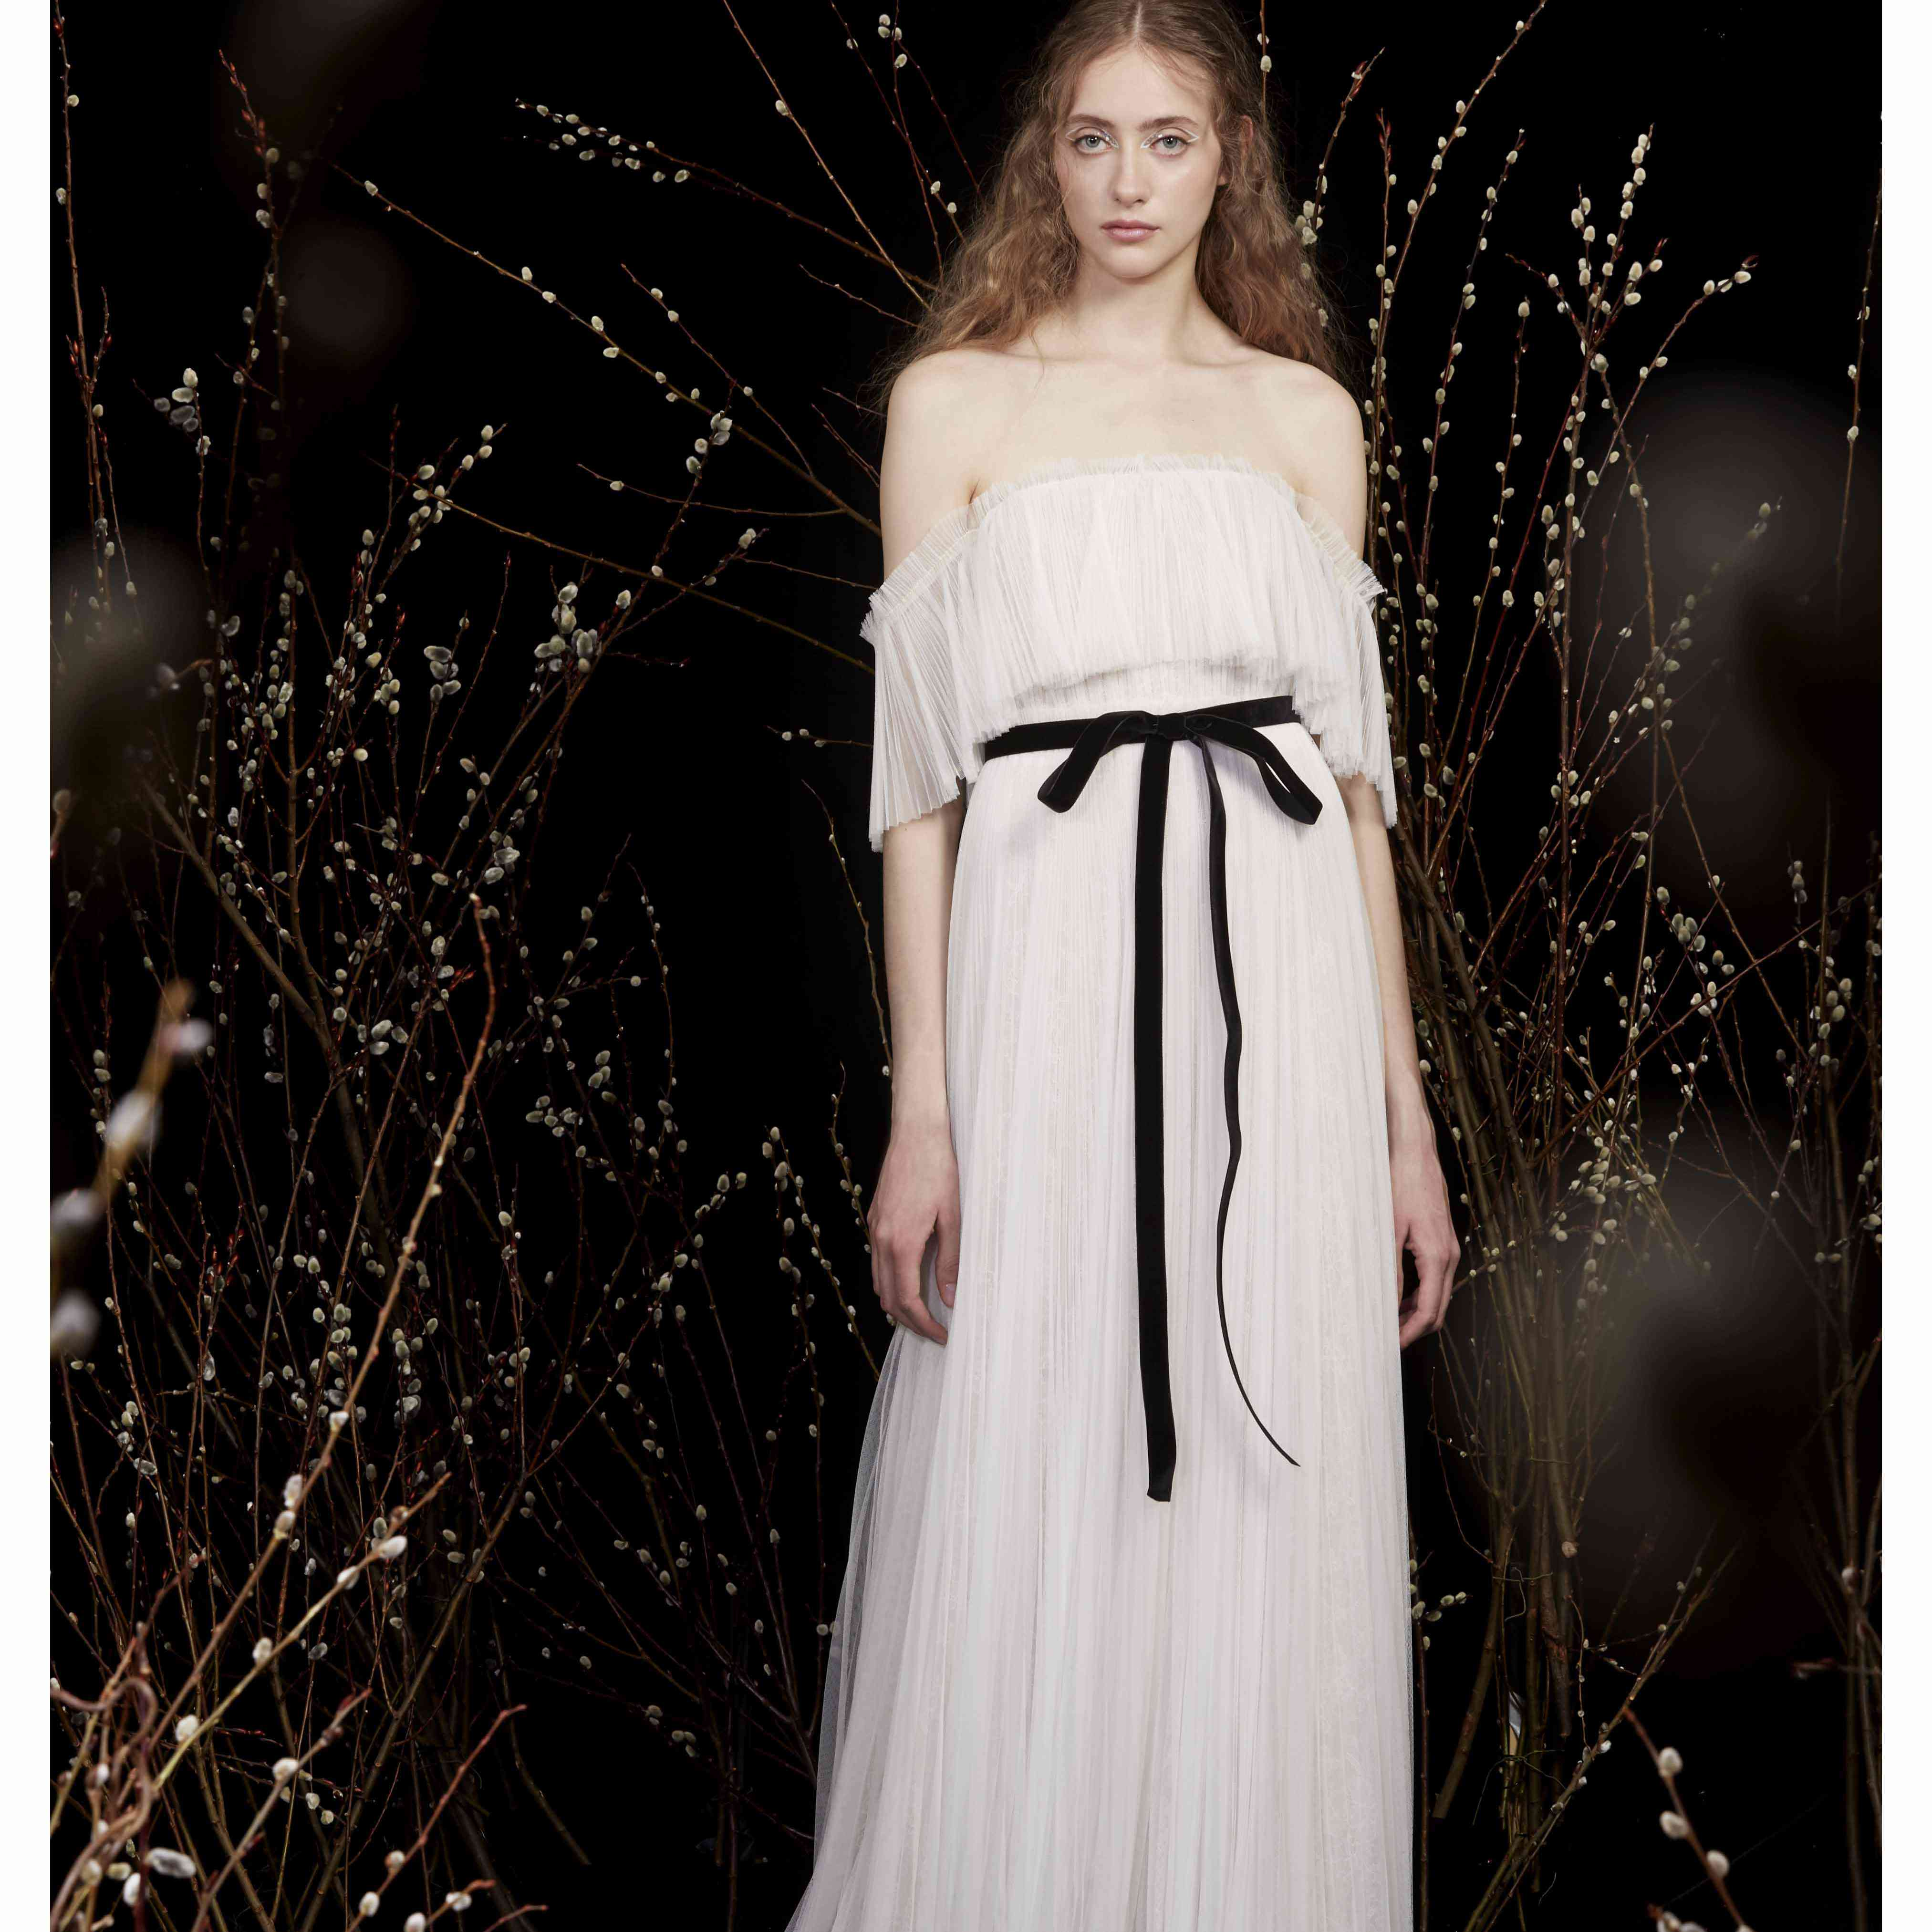 Model in off-the-sleeve wedding dress